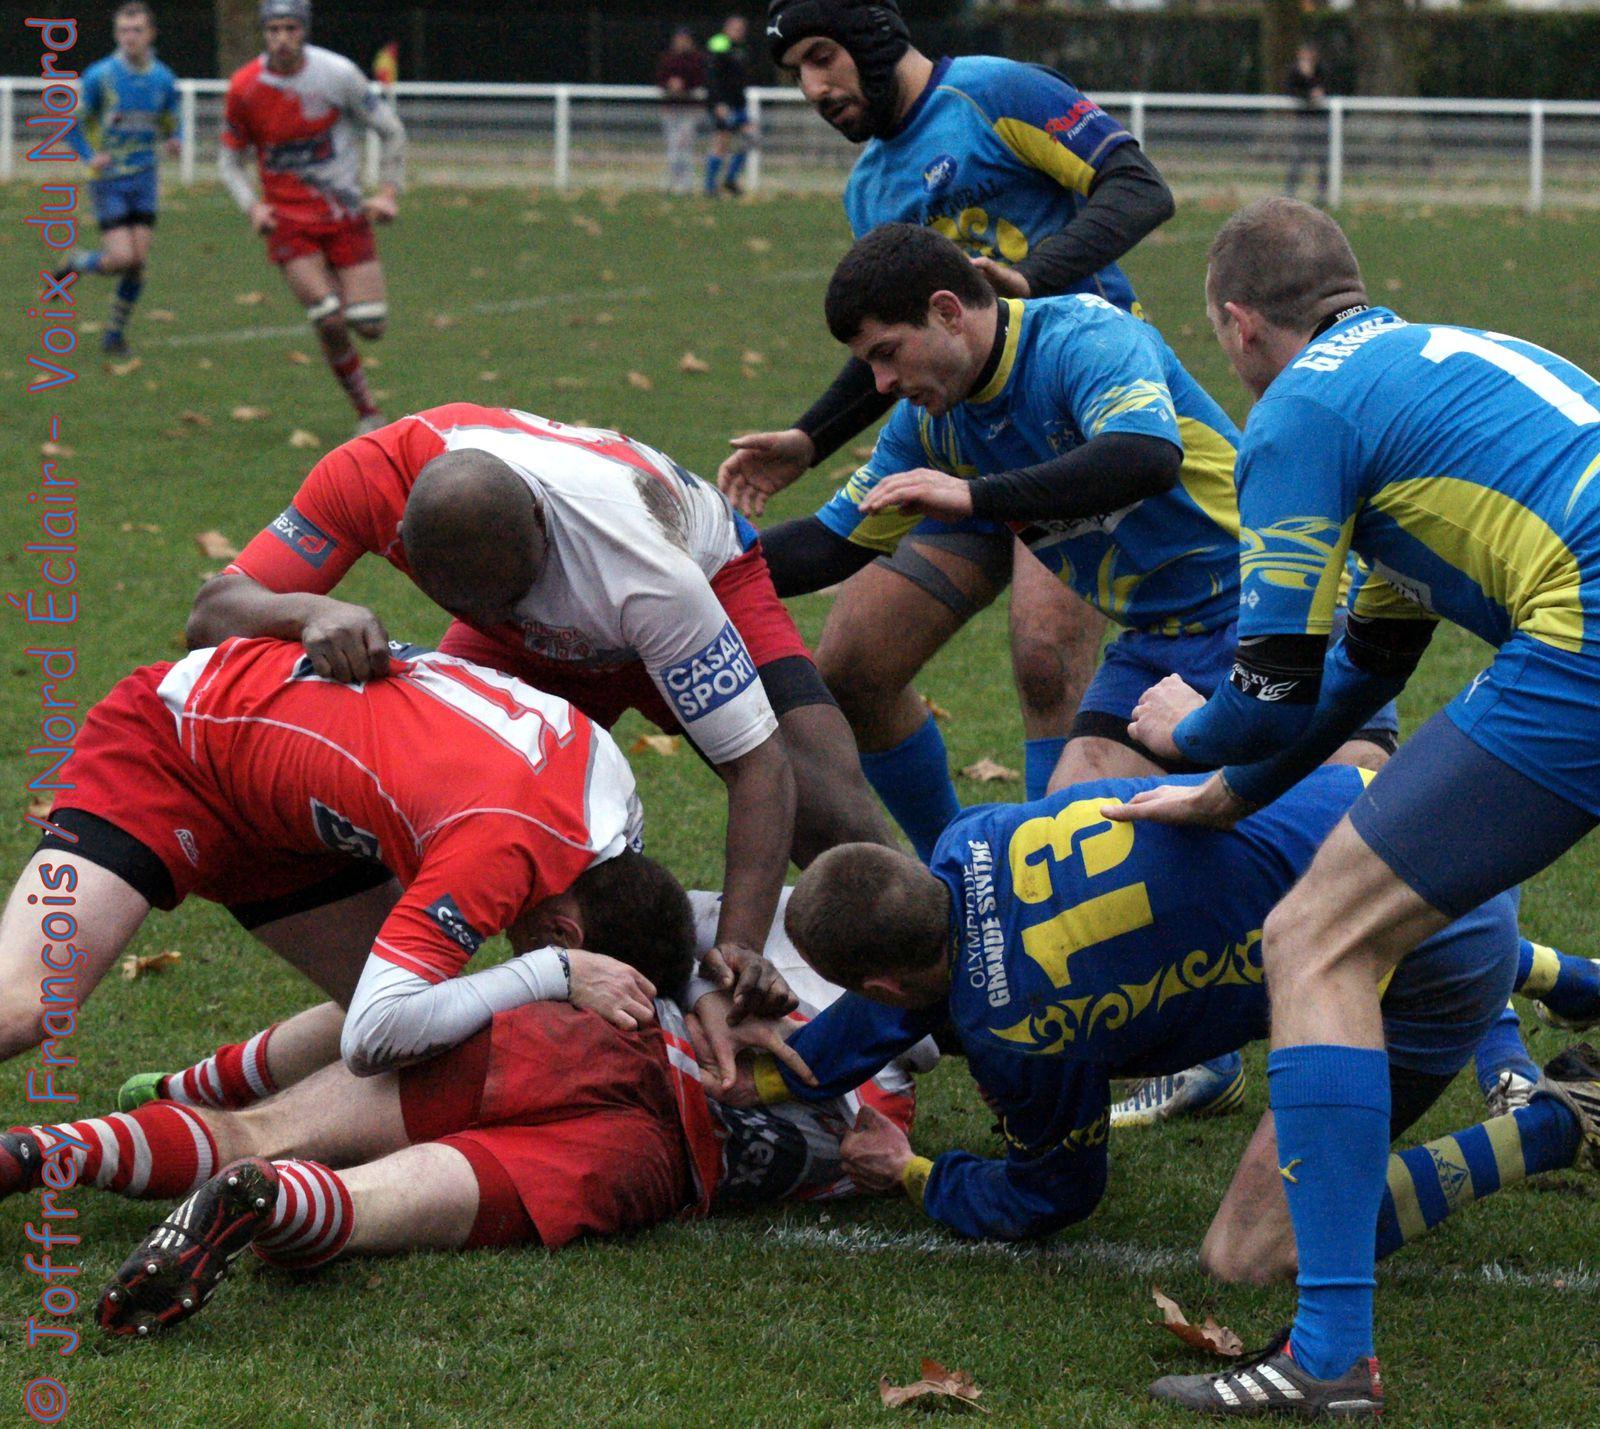 01.12.13 Foot DHR + Rugby PH